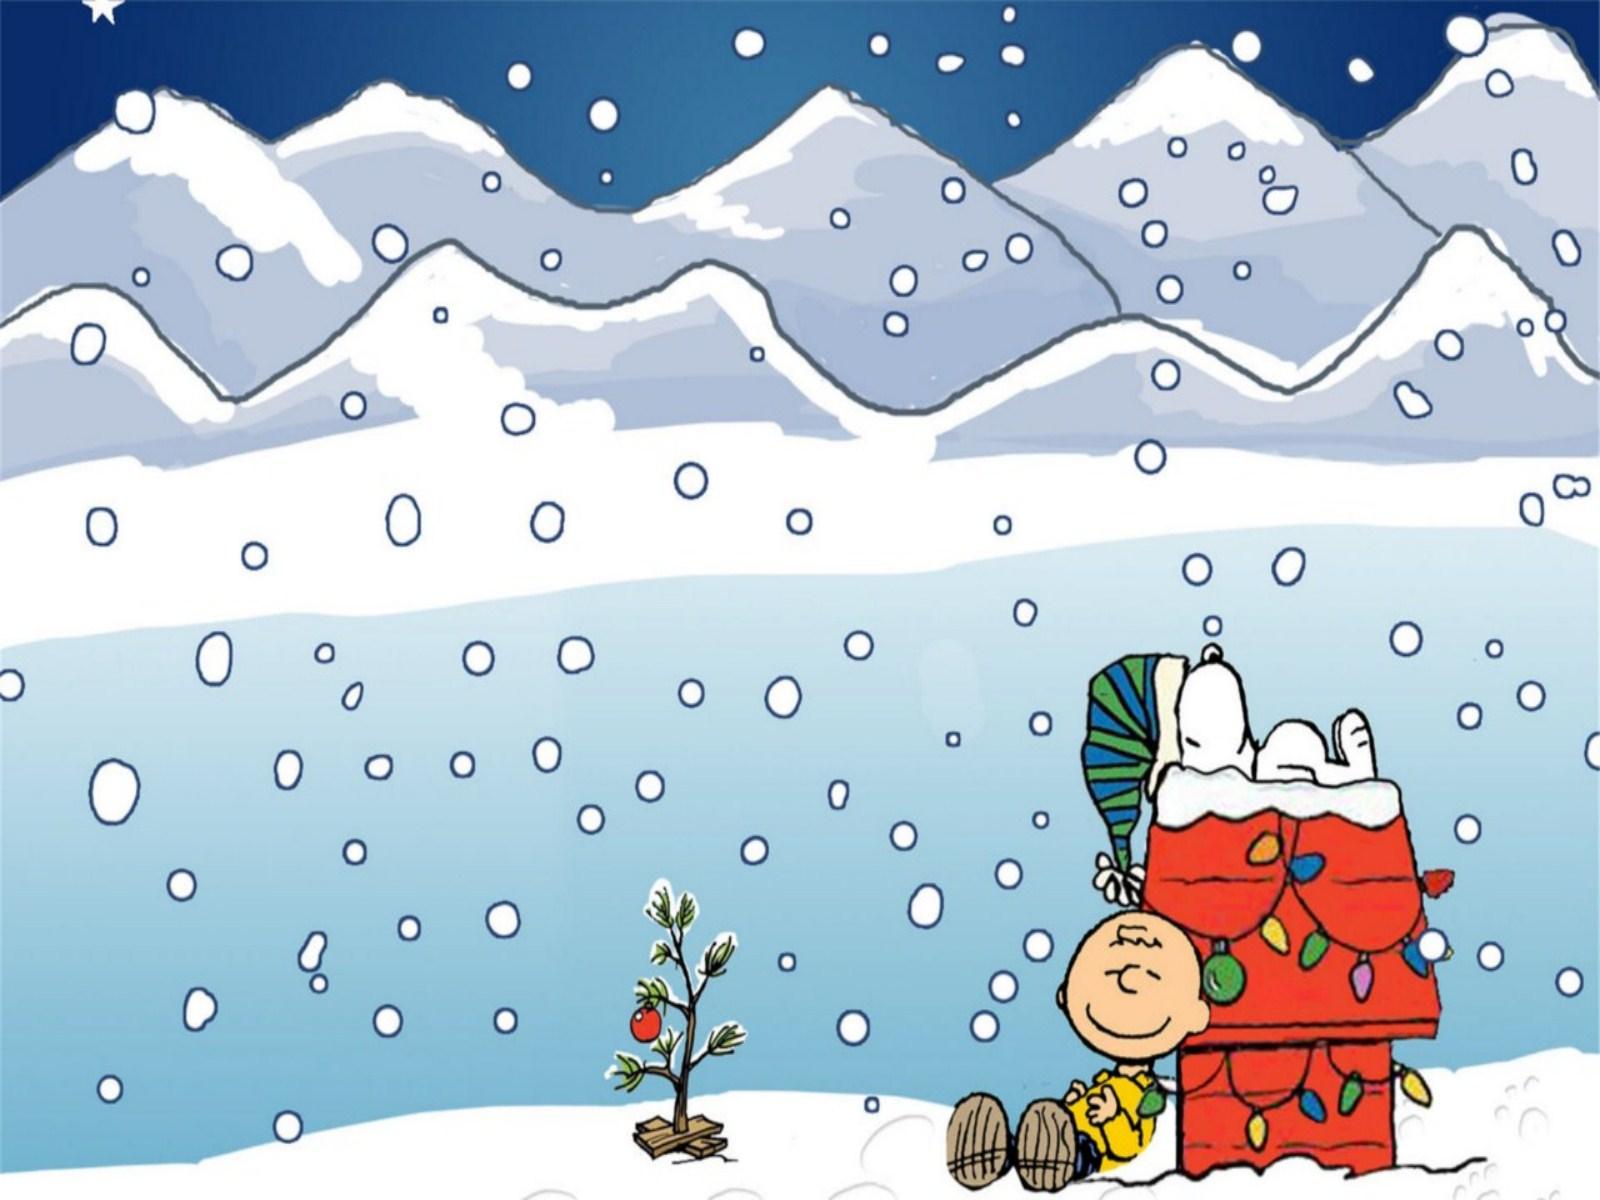 Charlie Brown Christmas Wallpaper Wallpaper Mansion 1600x1200